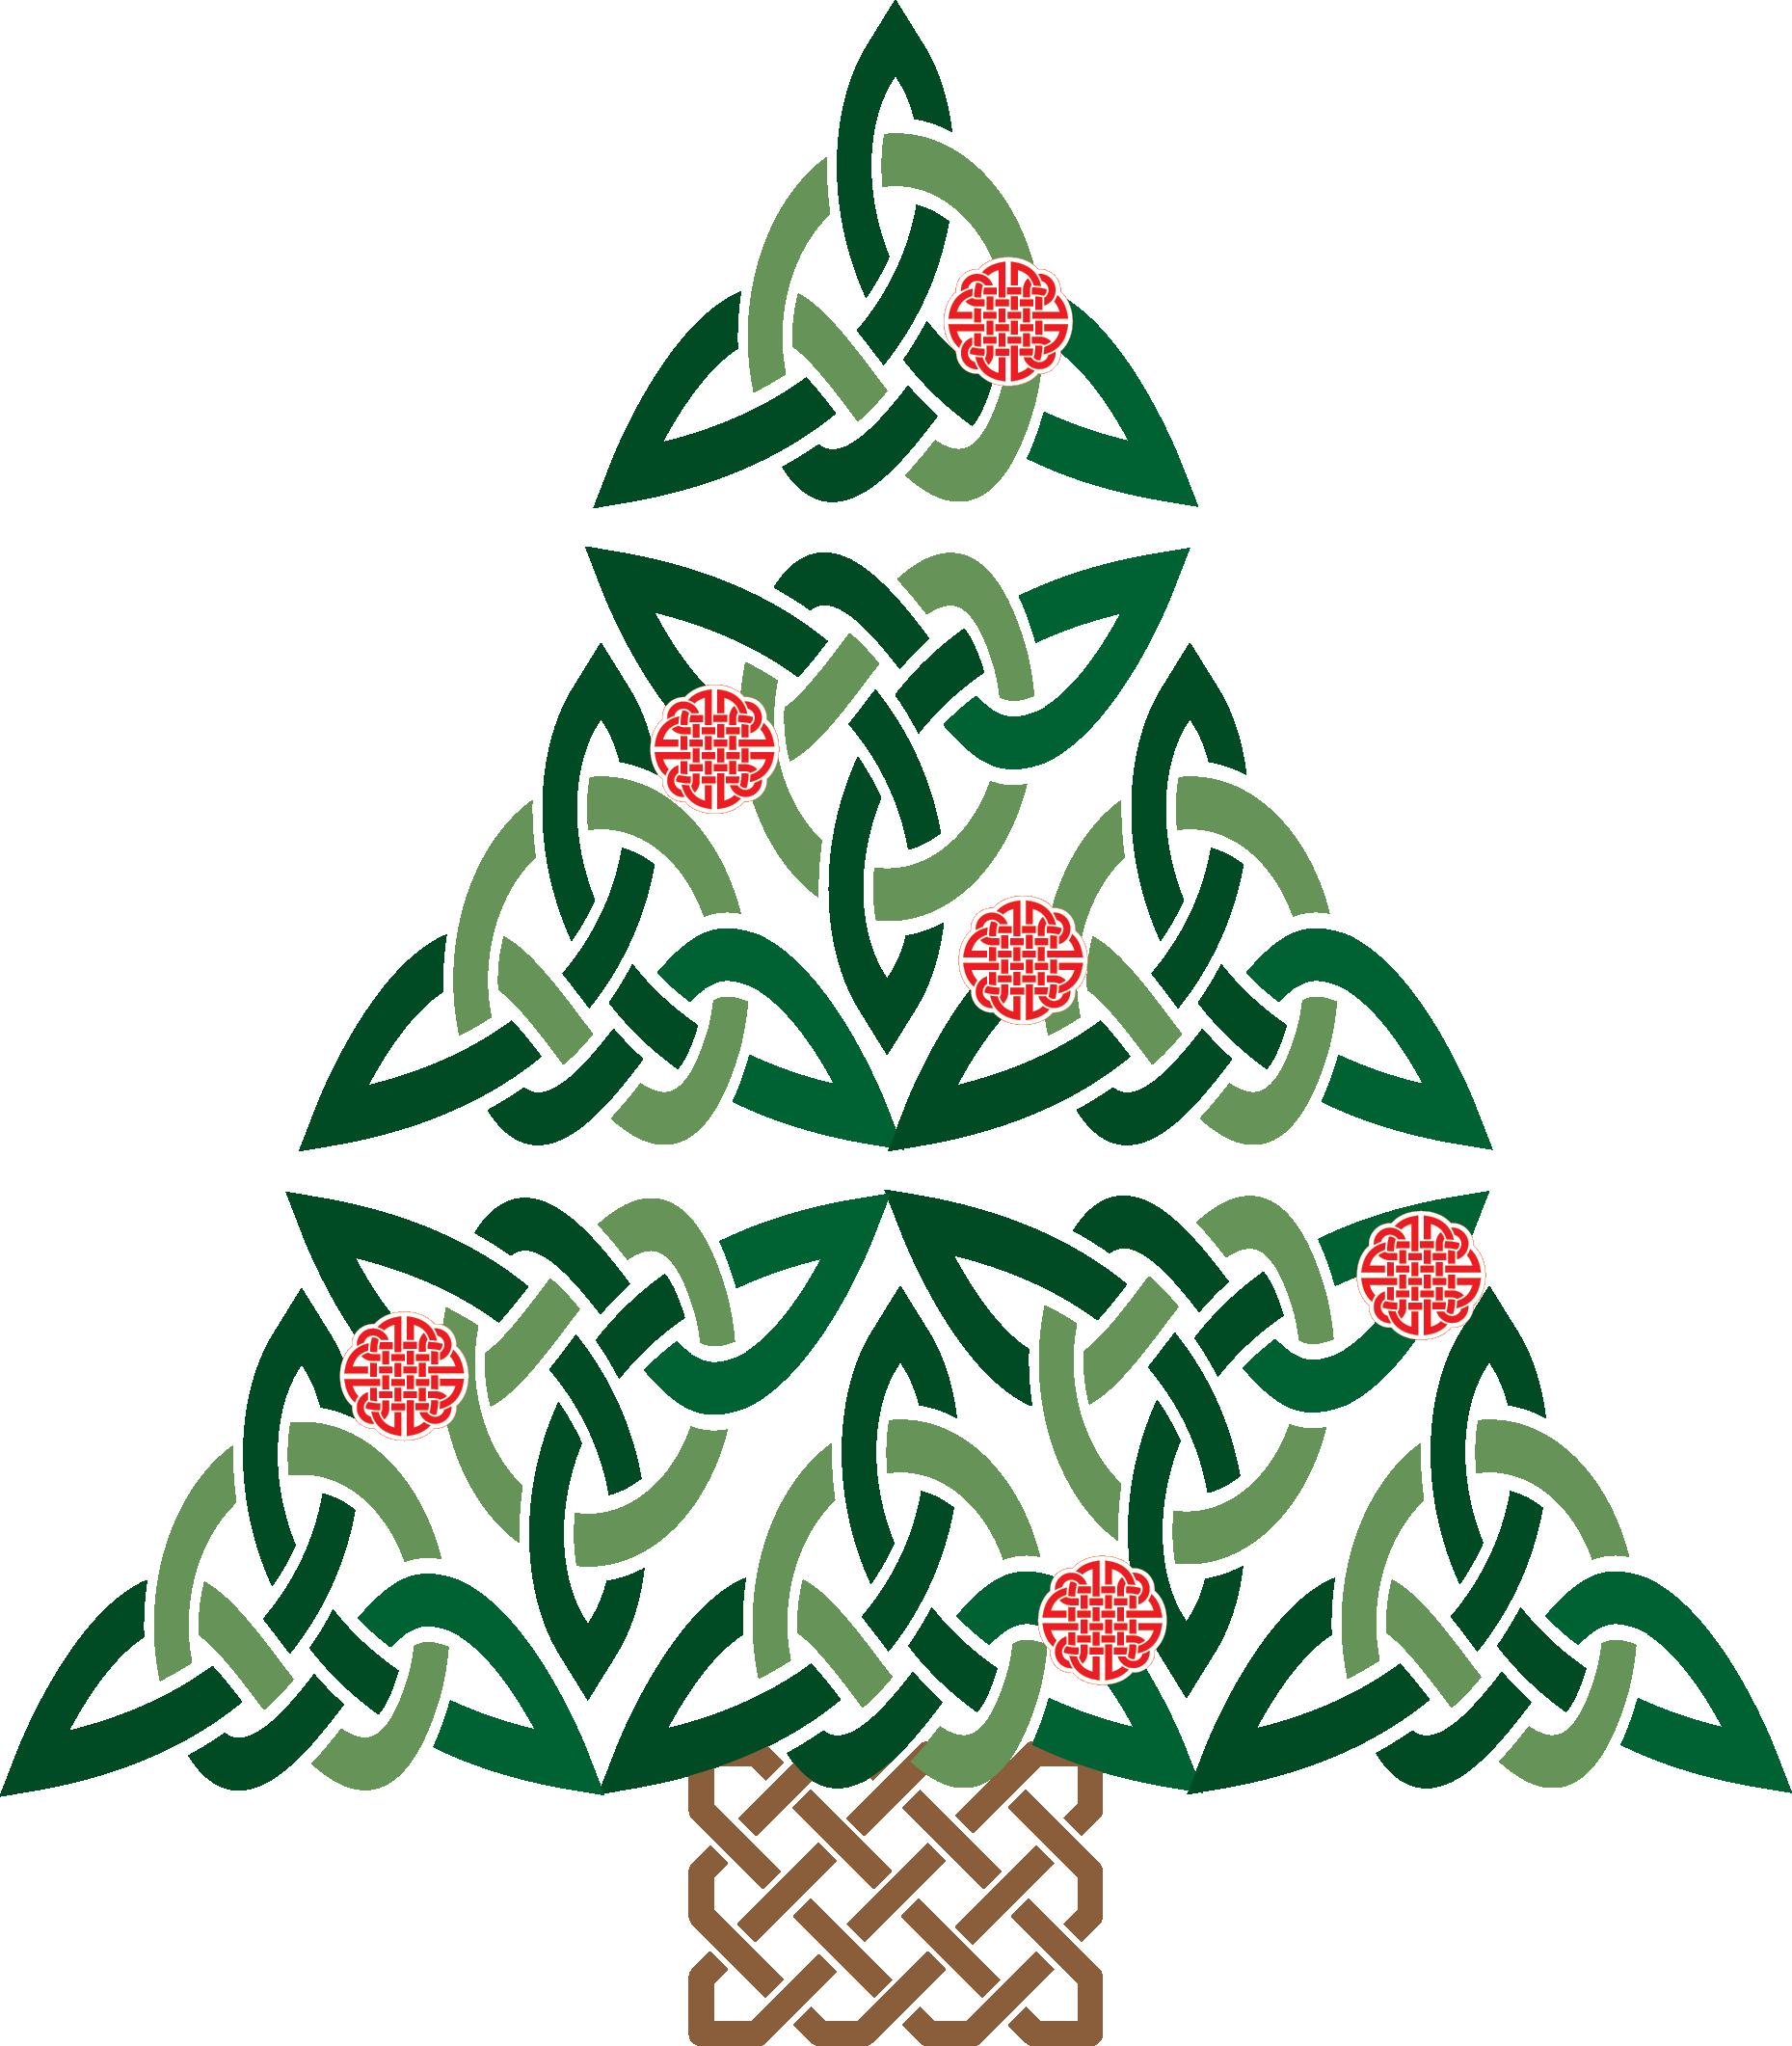 Flans Celtic Christmas Tree.png